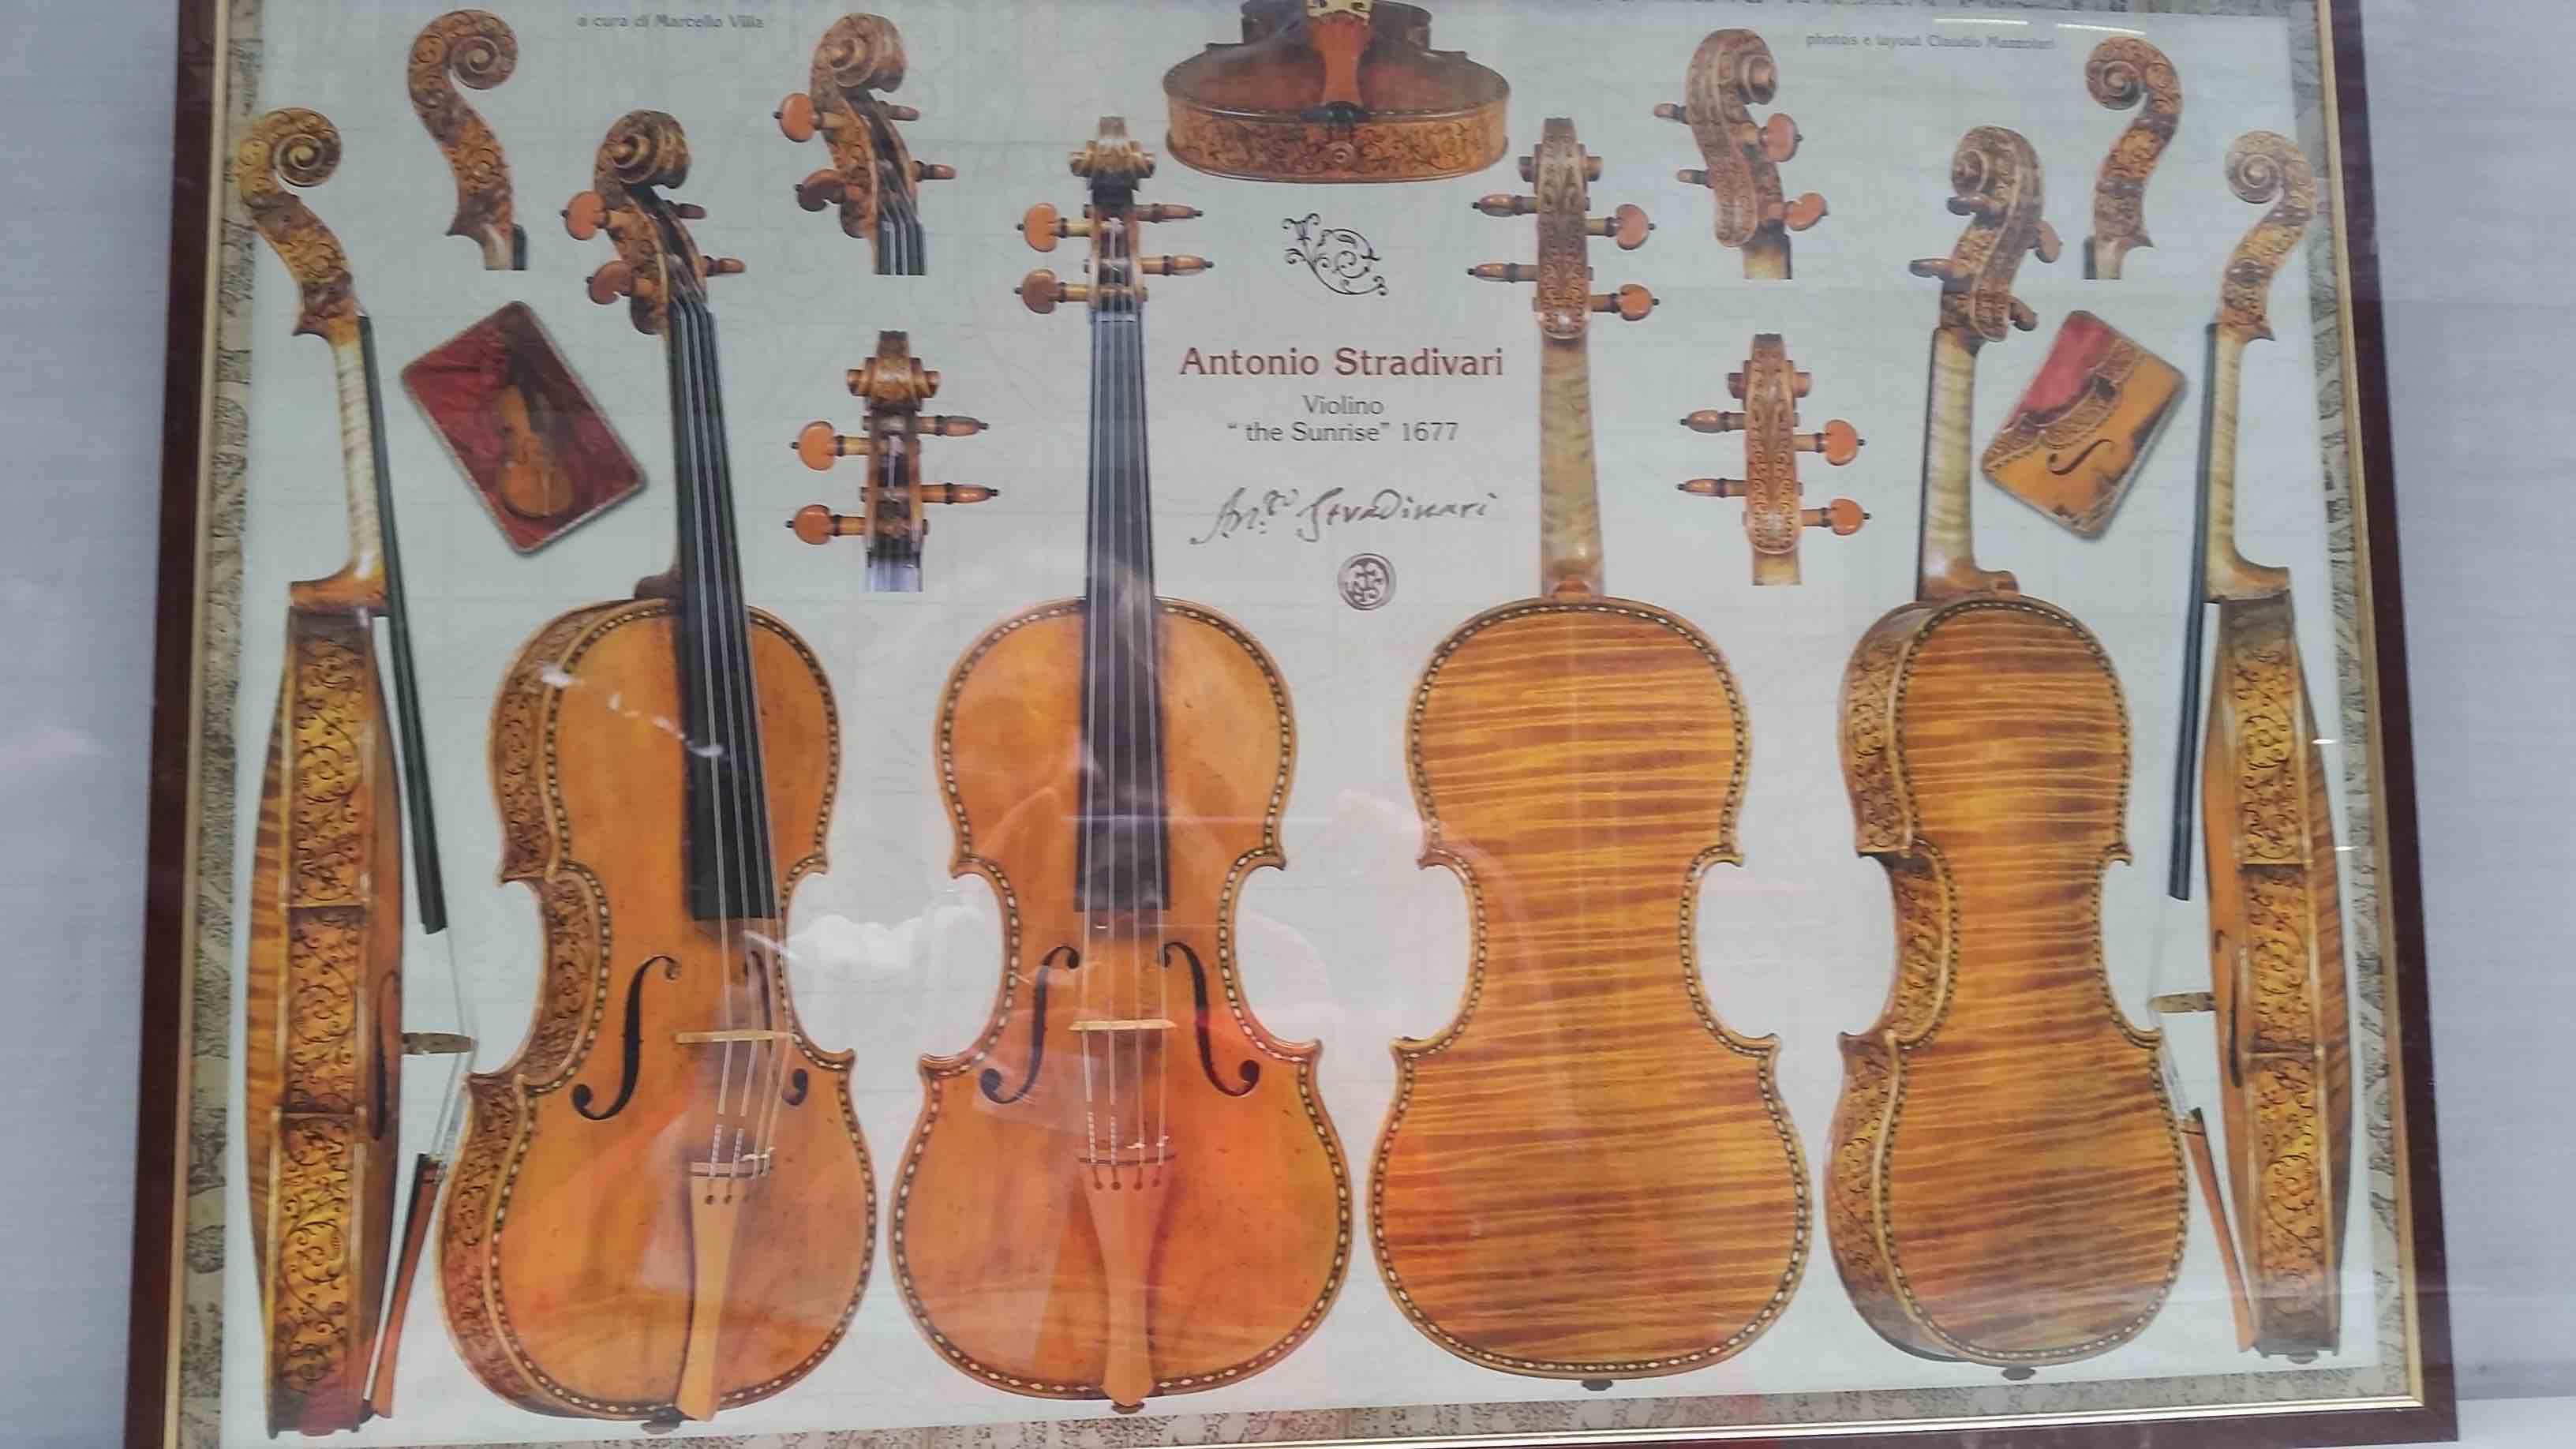 Cremona violins